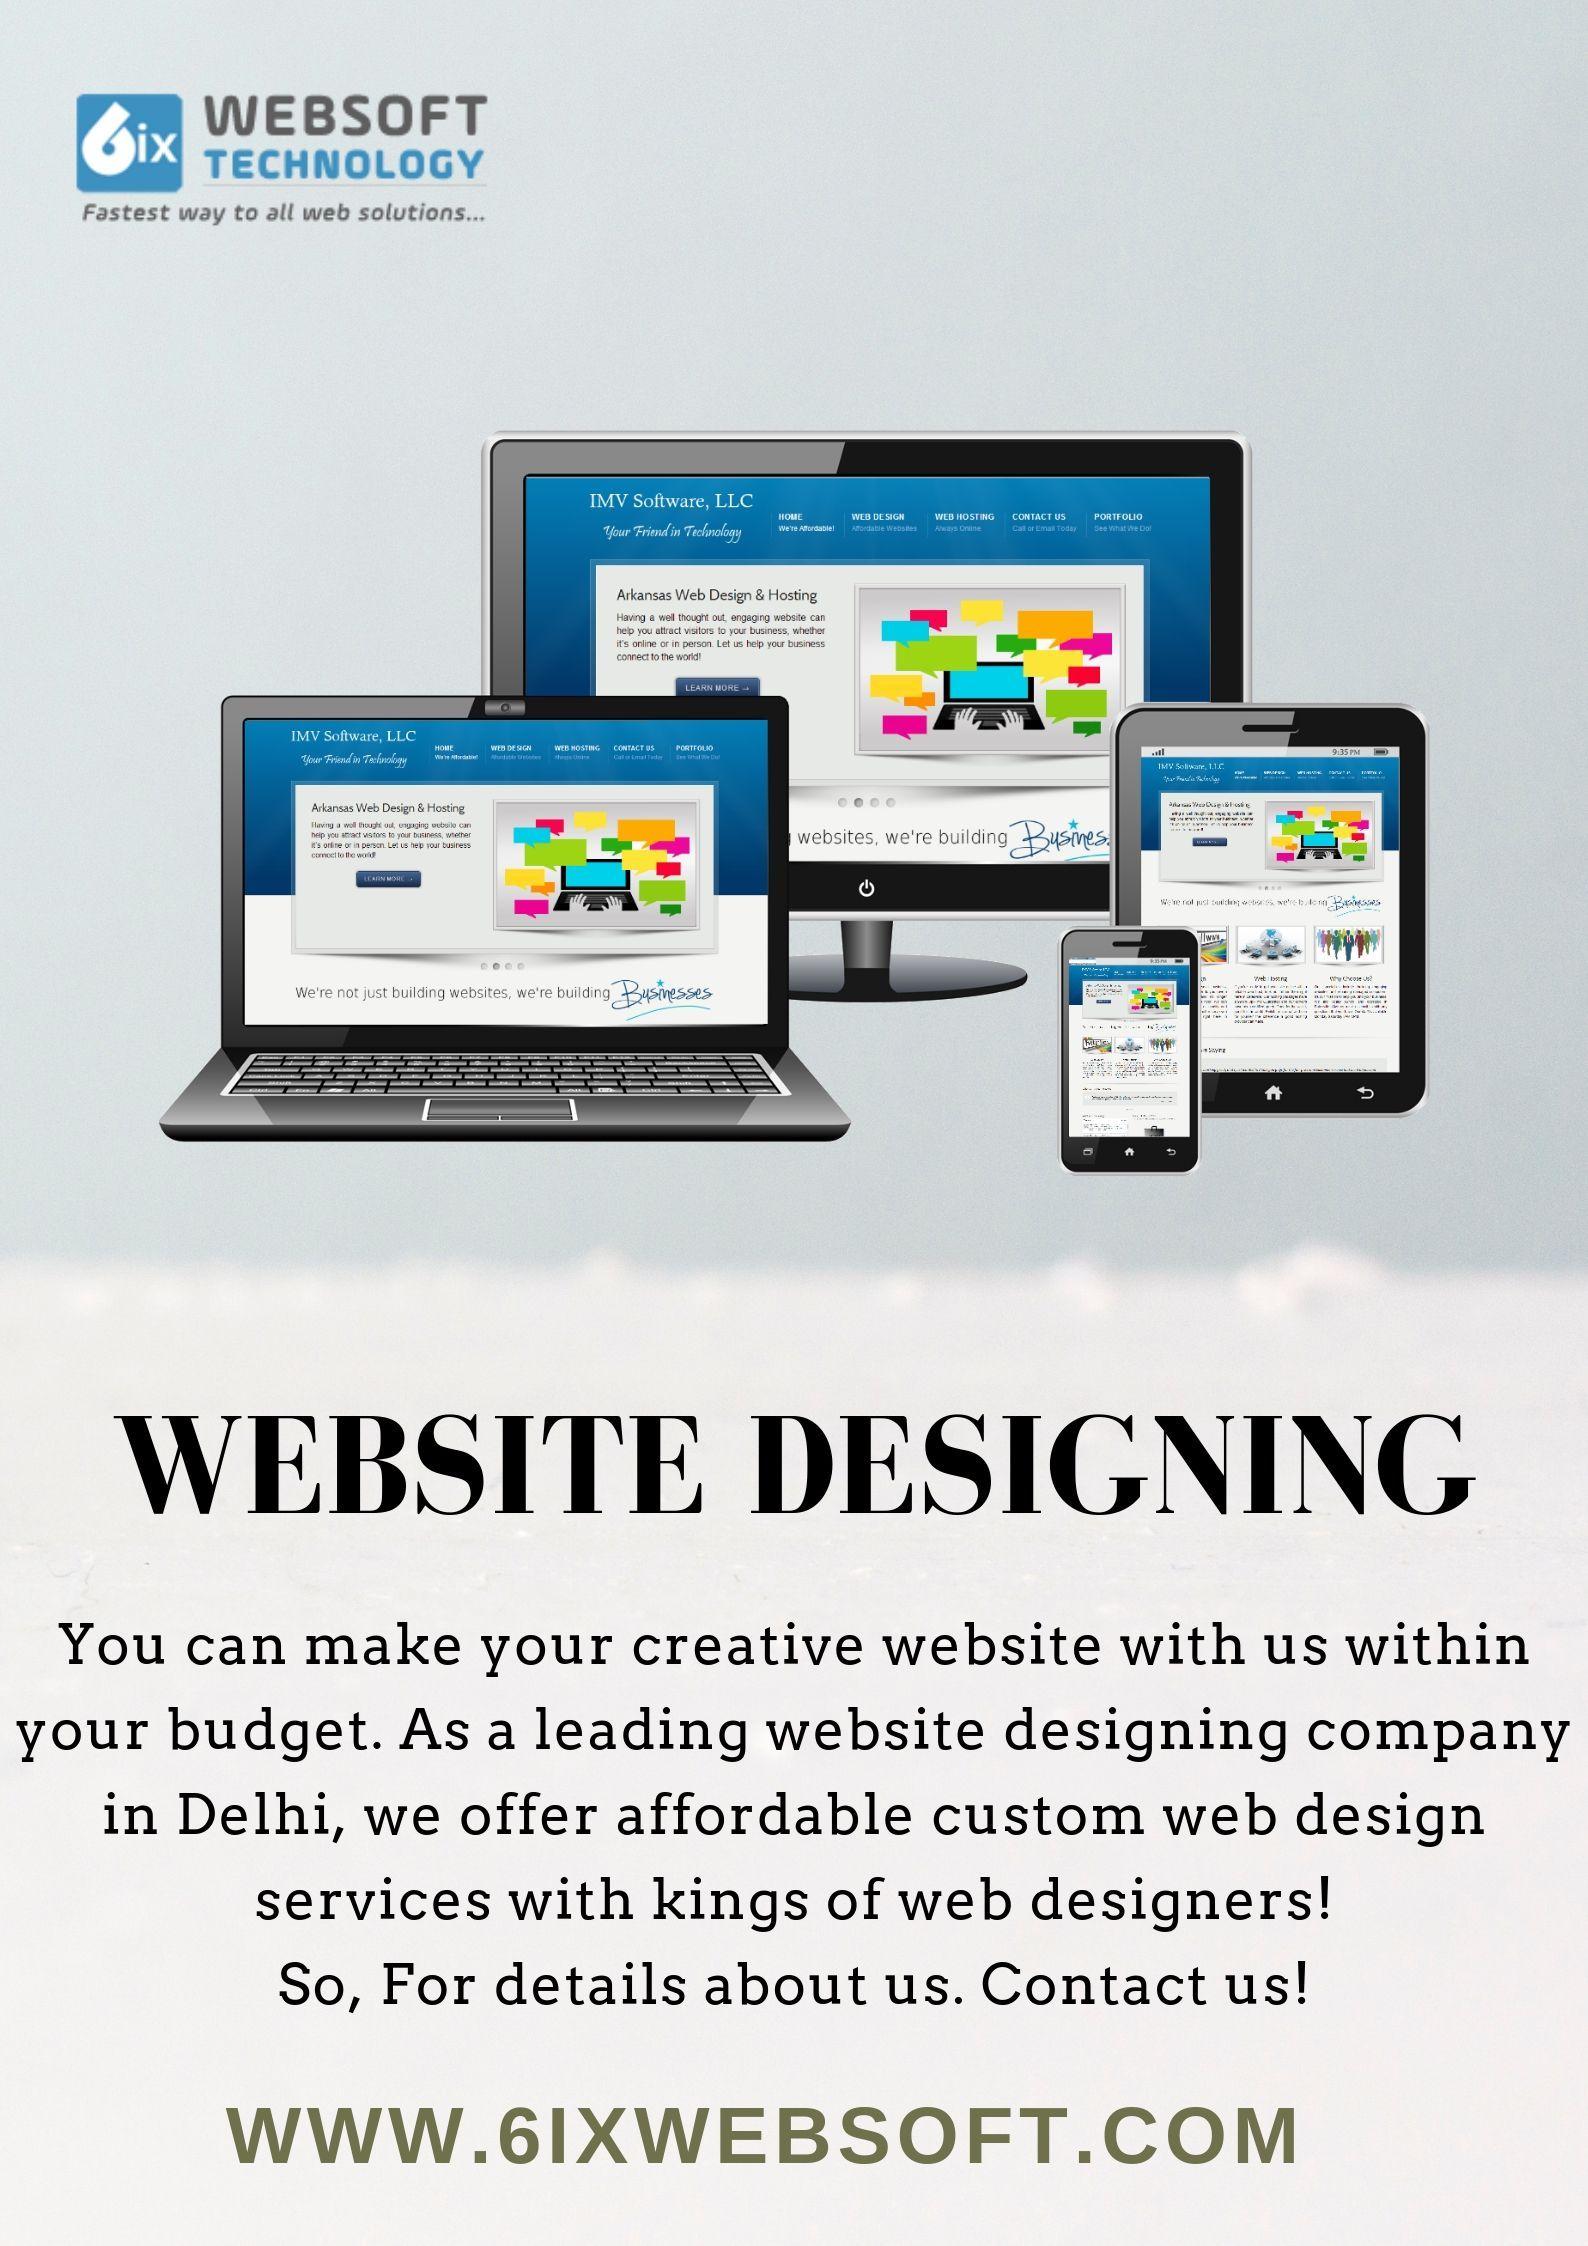 Website Designing Services In Delhi Web Design Services Website Design Fun Website Design Website Design Services